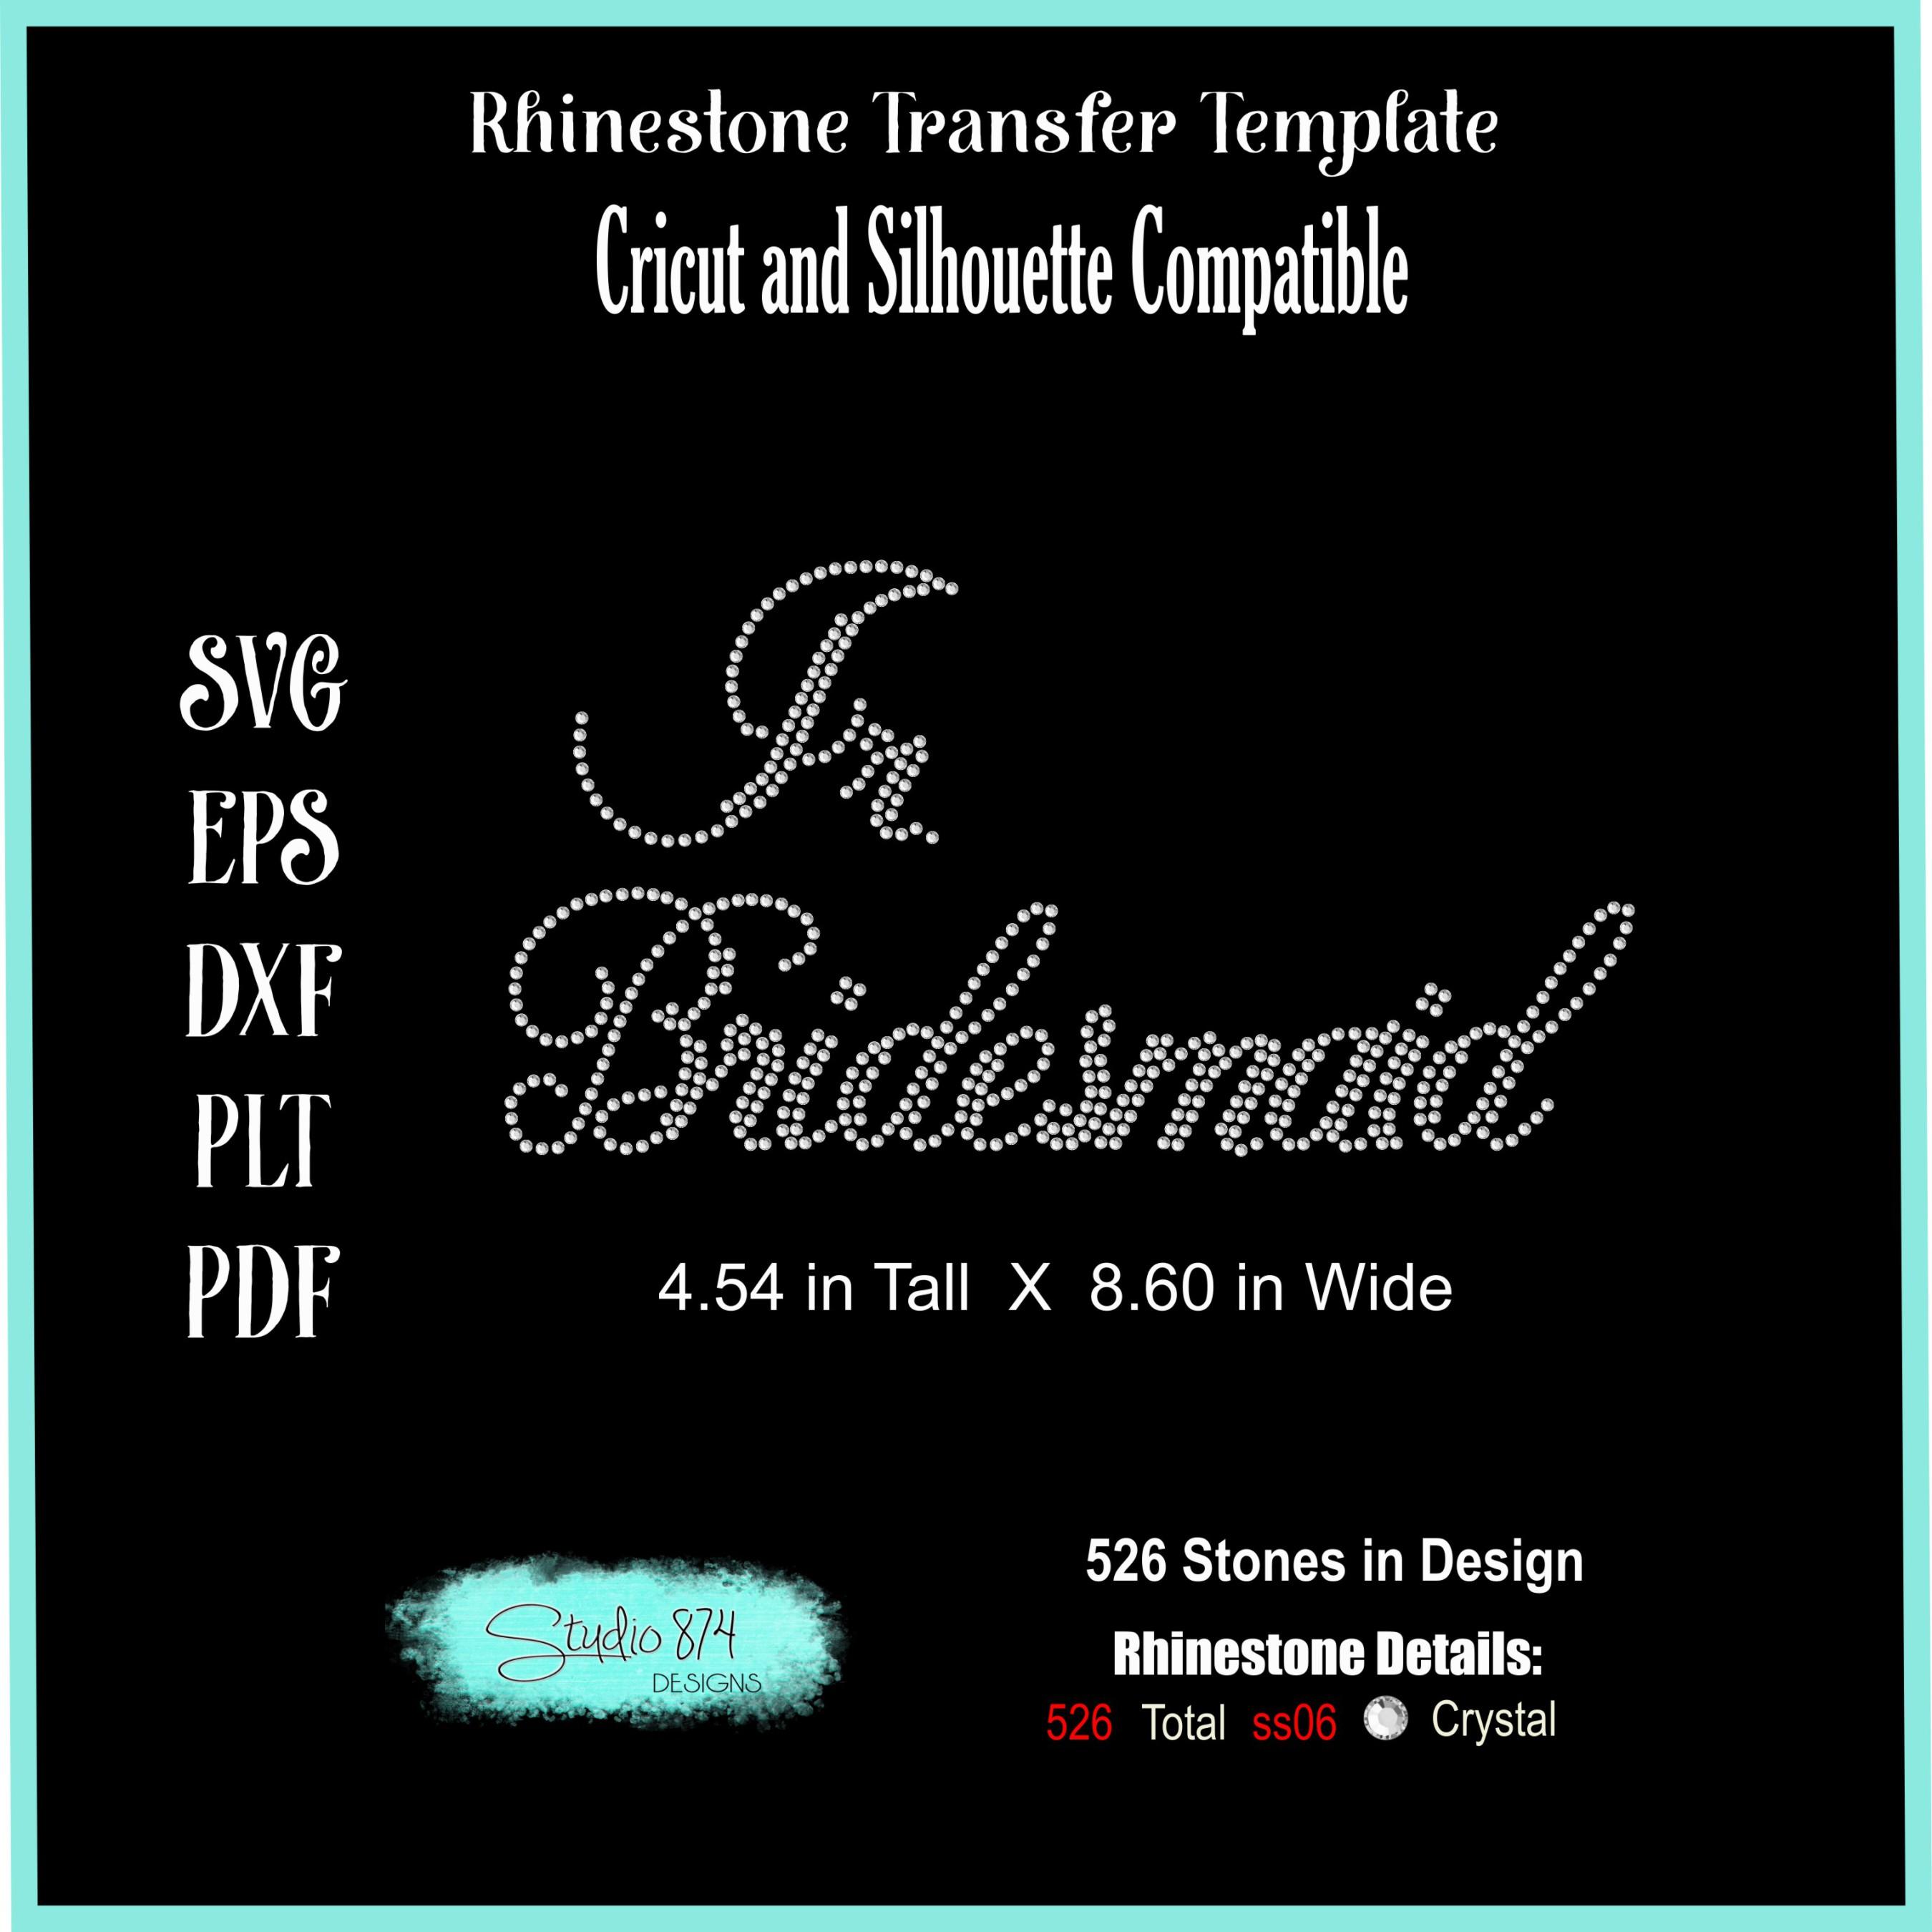 Wedding Rhinestone Template - Jr. Bridesmaid example image 2